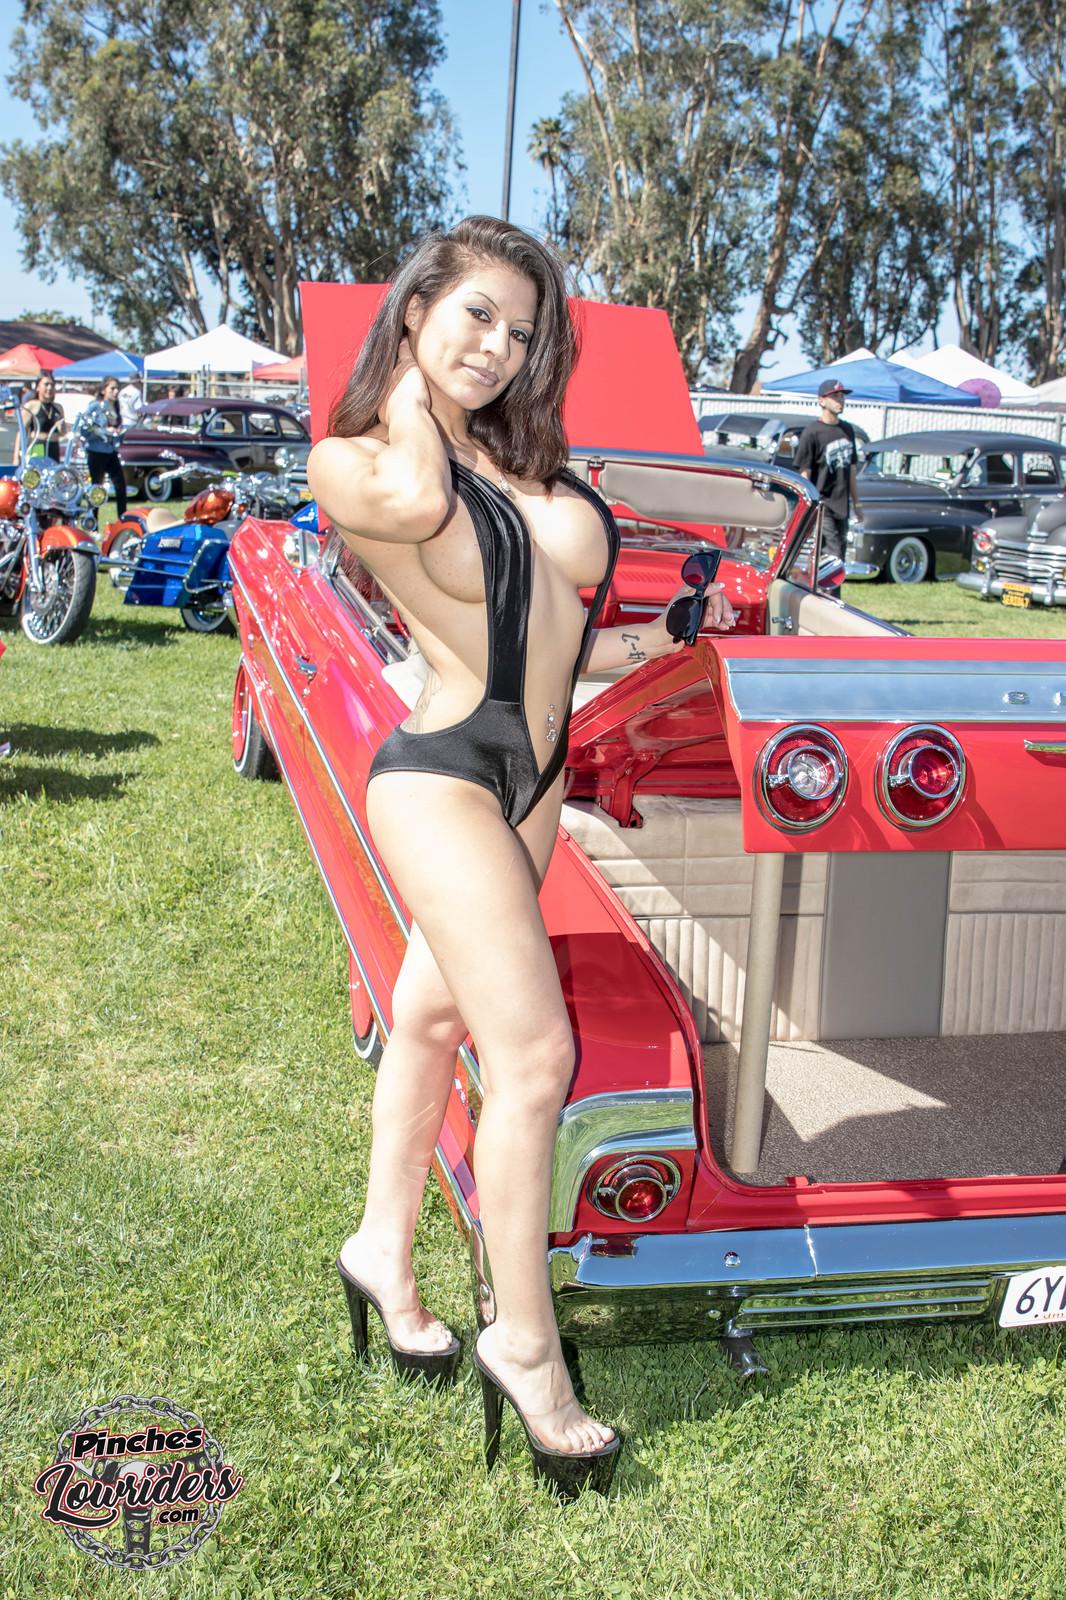 Pinches Lowriders Lowriders Lowriding Models Lowrider Custom - Salinas car show